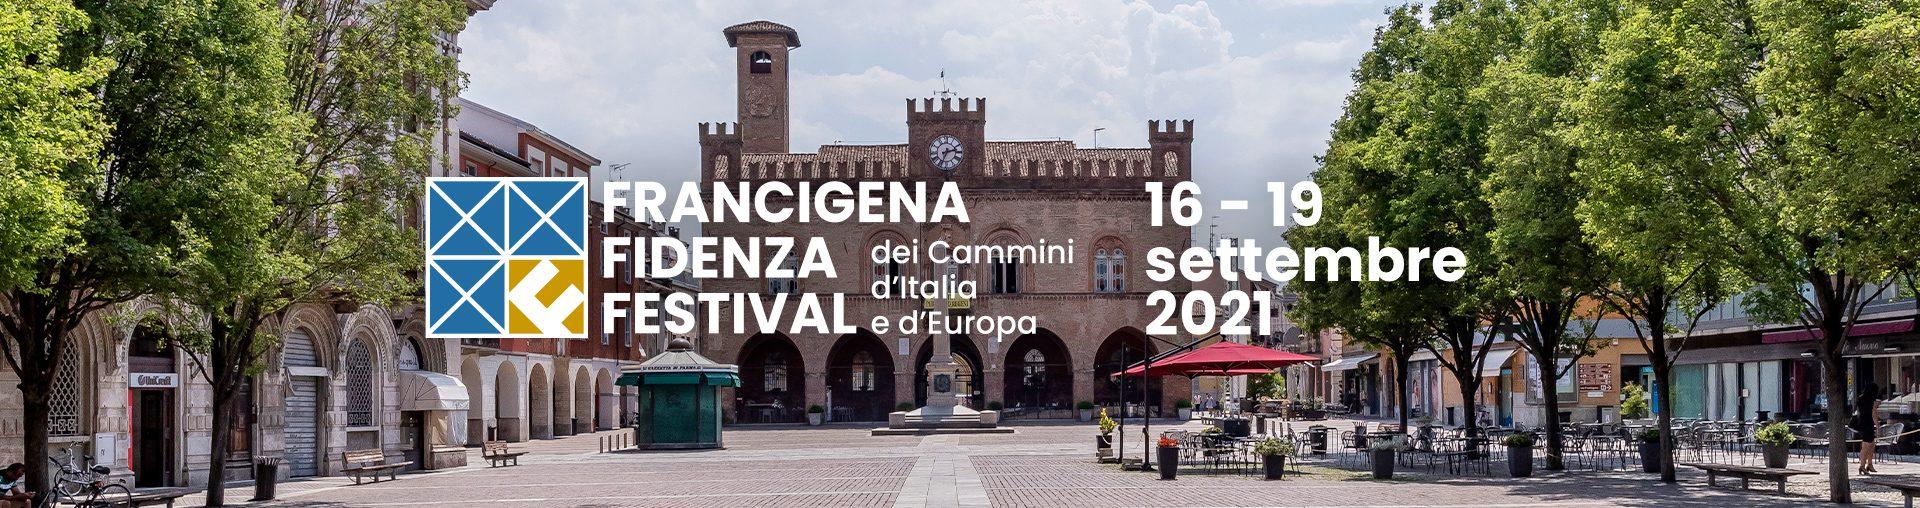 francigena fidenza festival